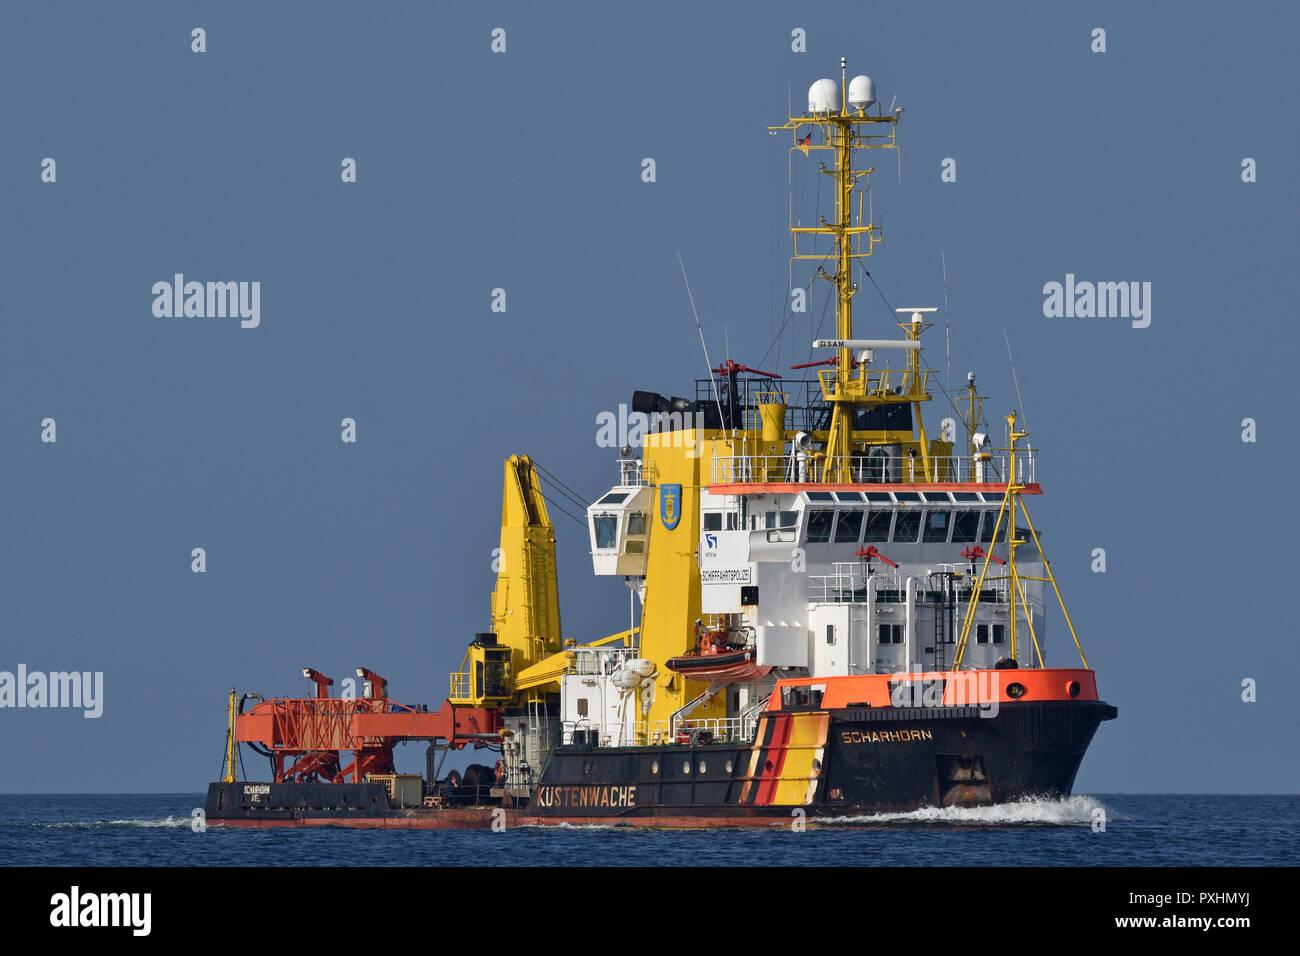 Bouy tender Scharhörn inbound for Kiel Stock Photo